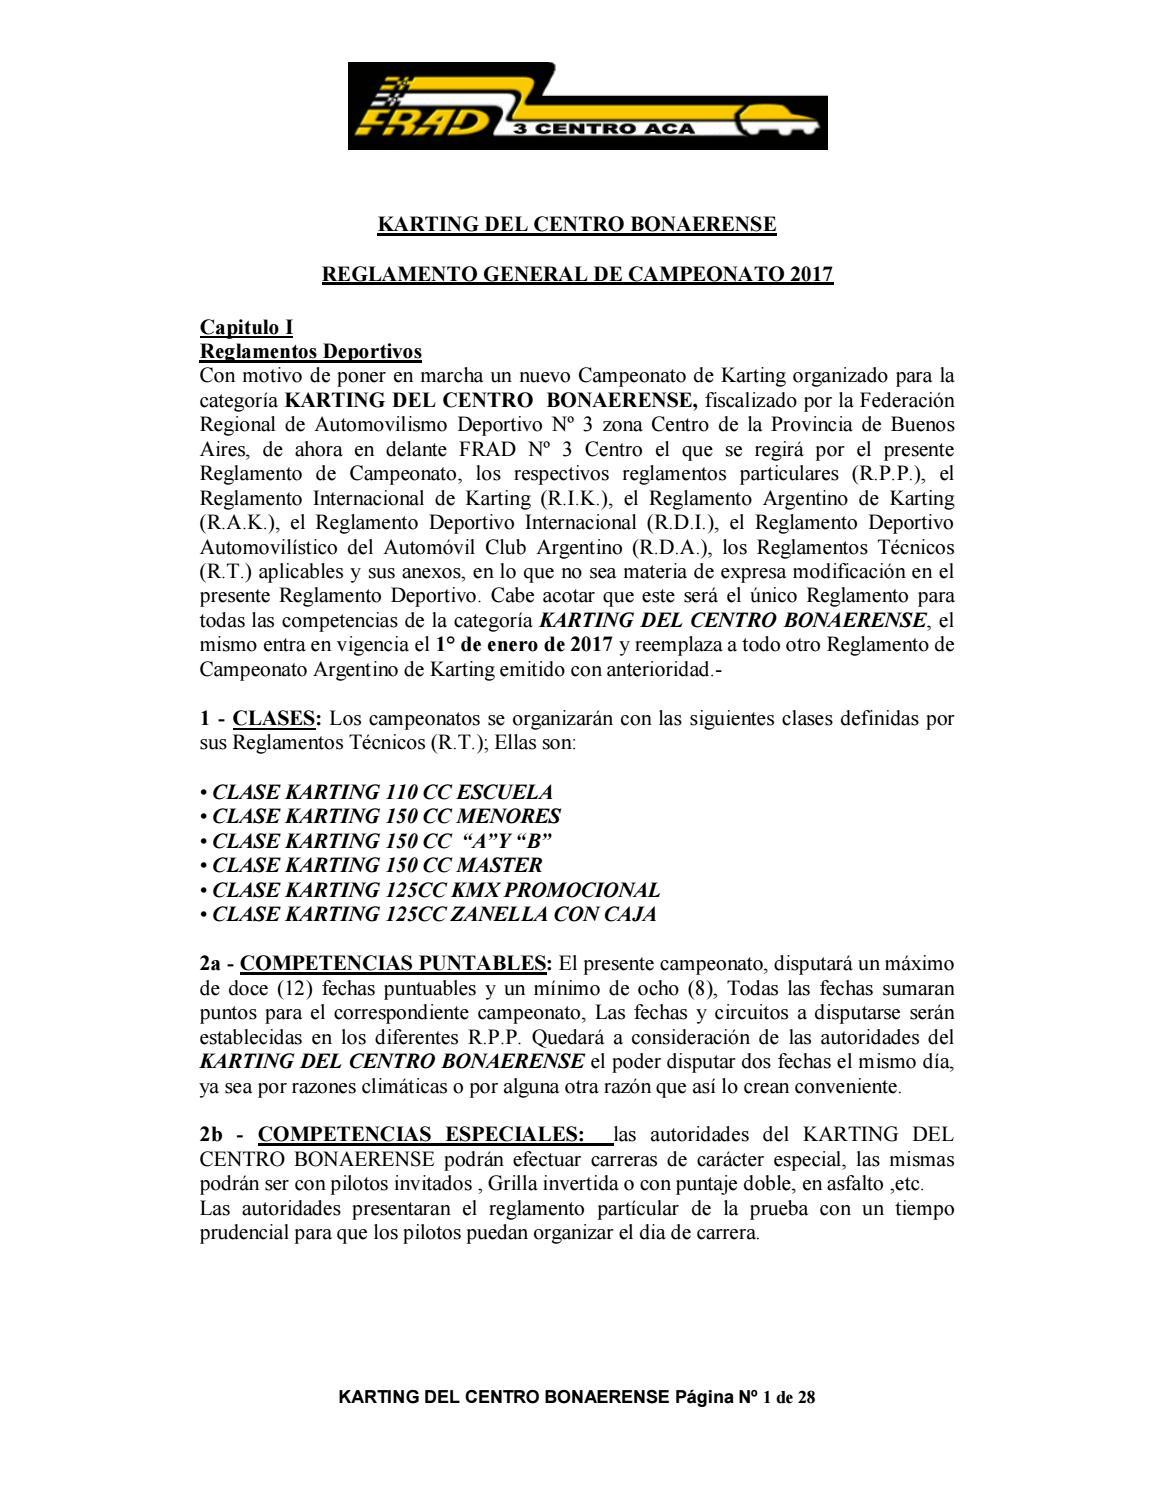 Reglamento deportivo 2017 - KDC by Marta Hetem - issuu